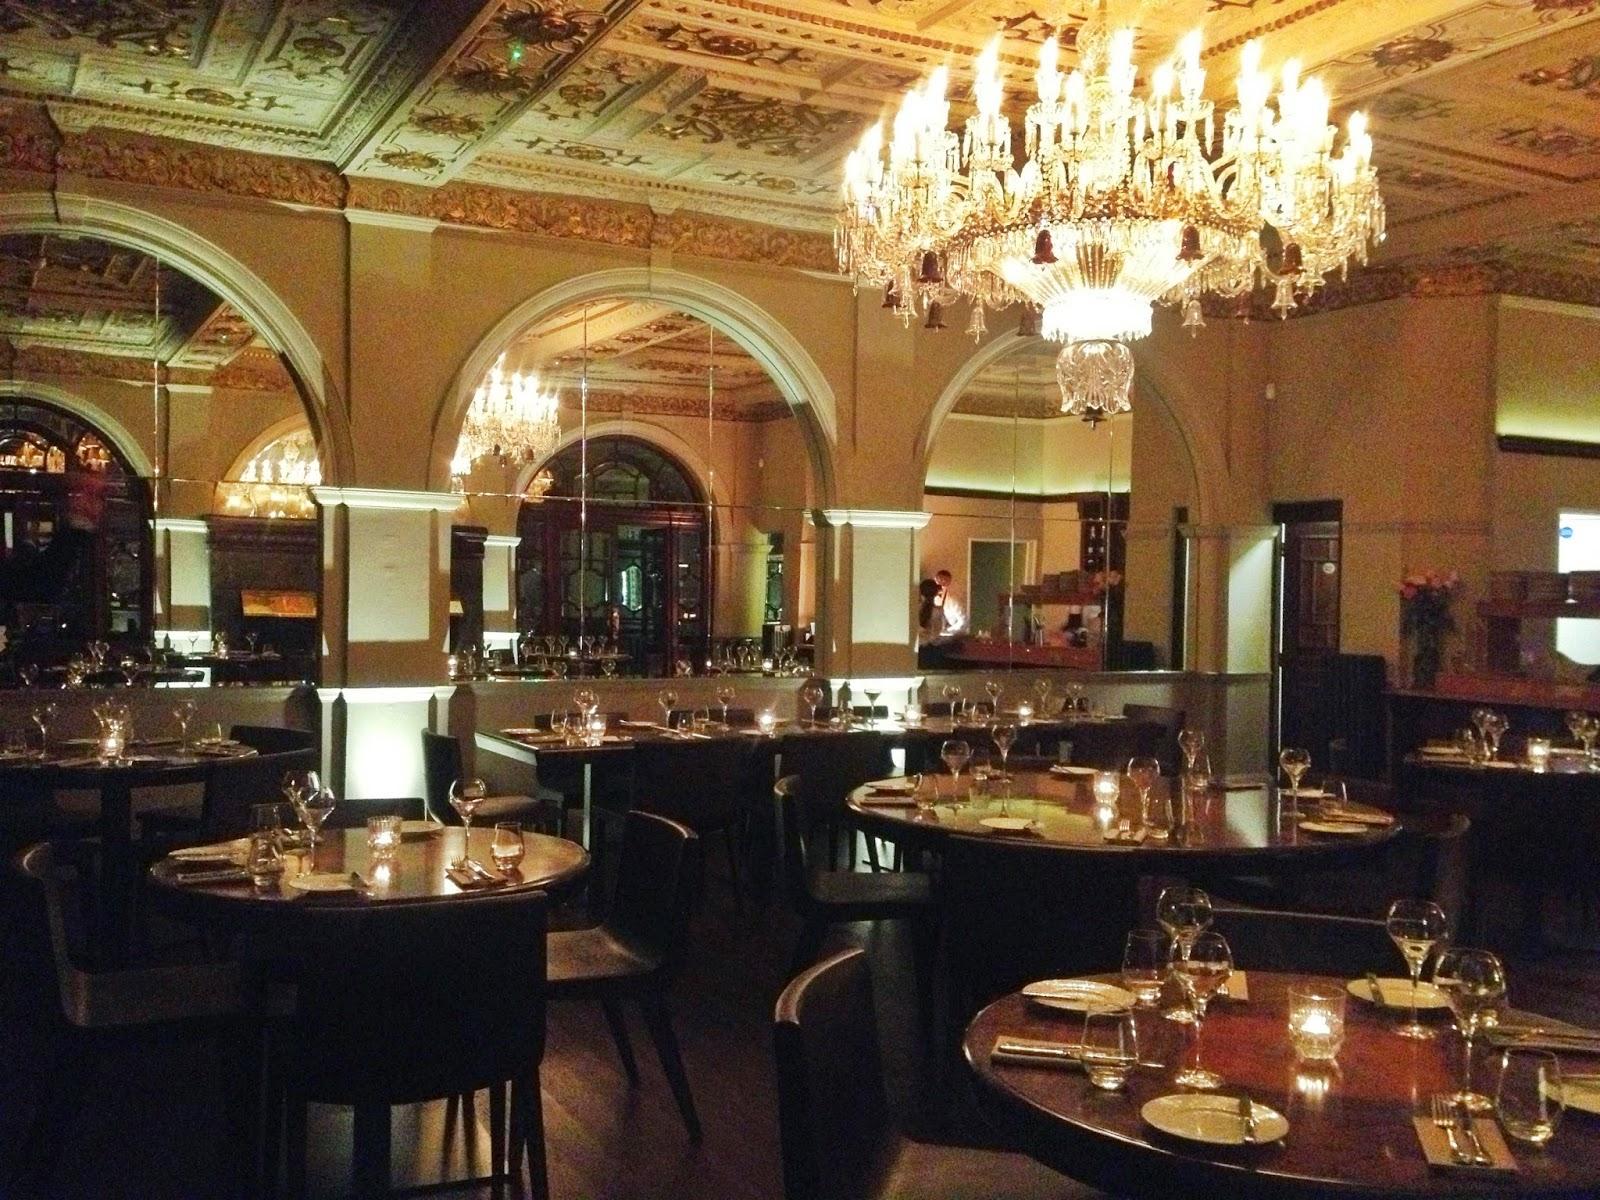 Crocker's Folly restaurant in St John's Wood, London